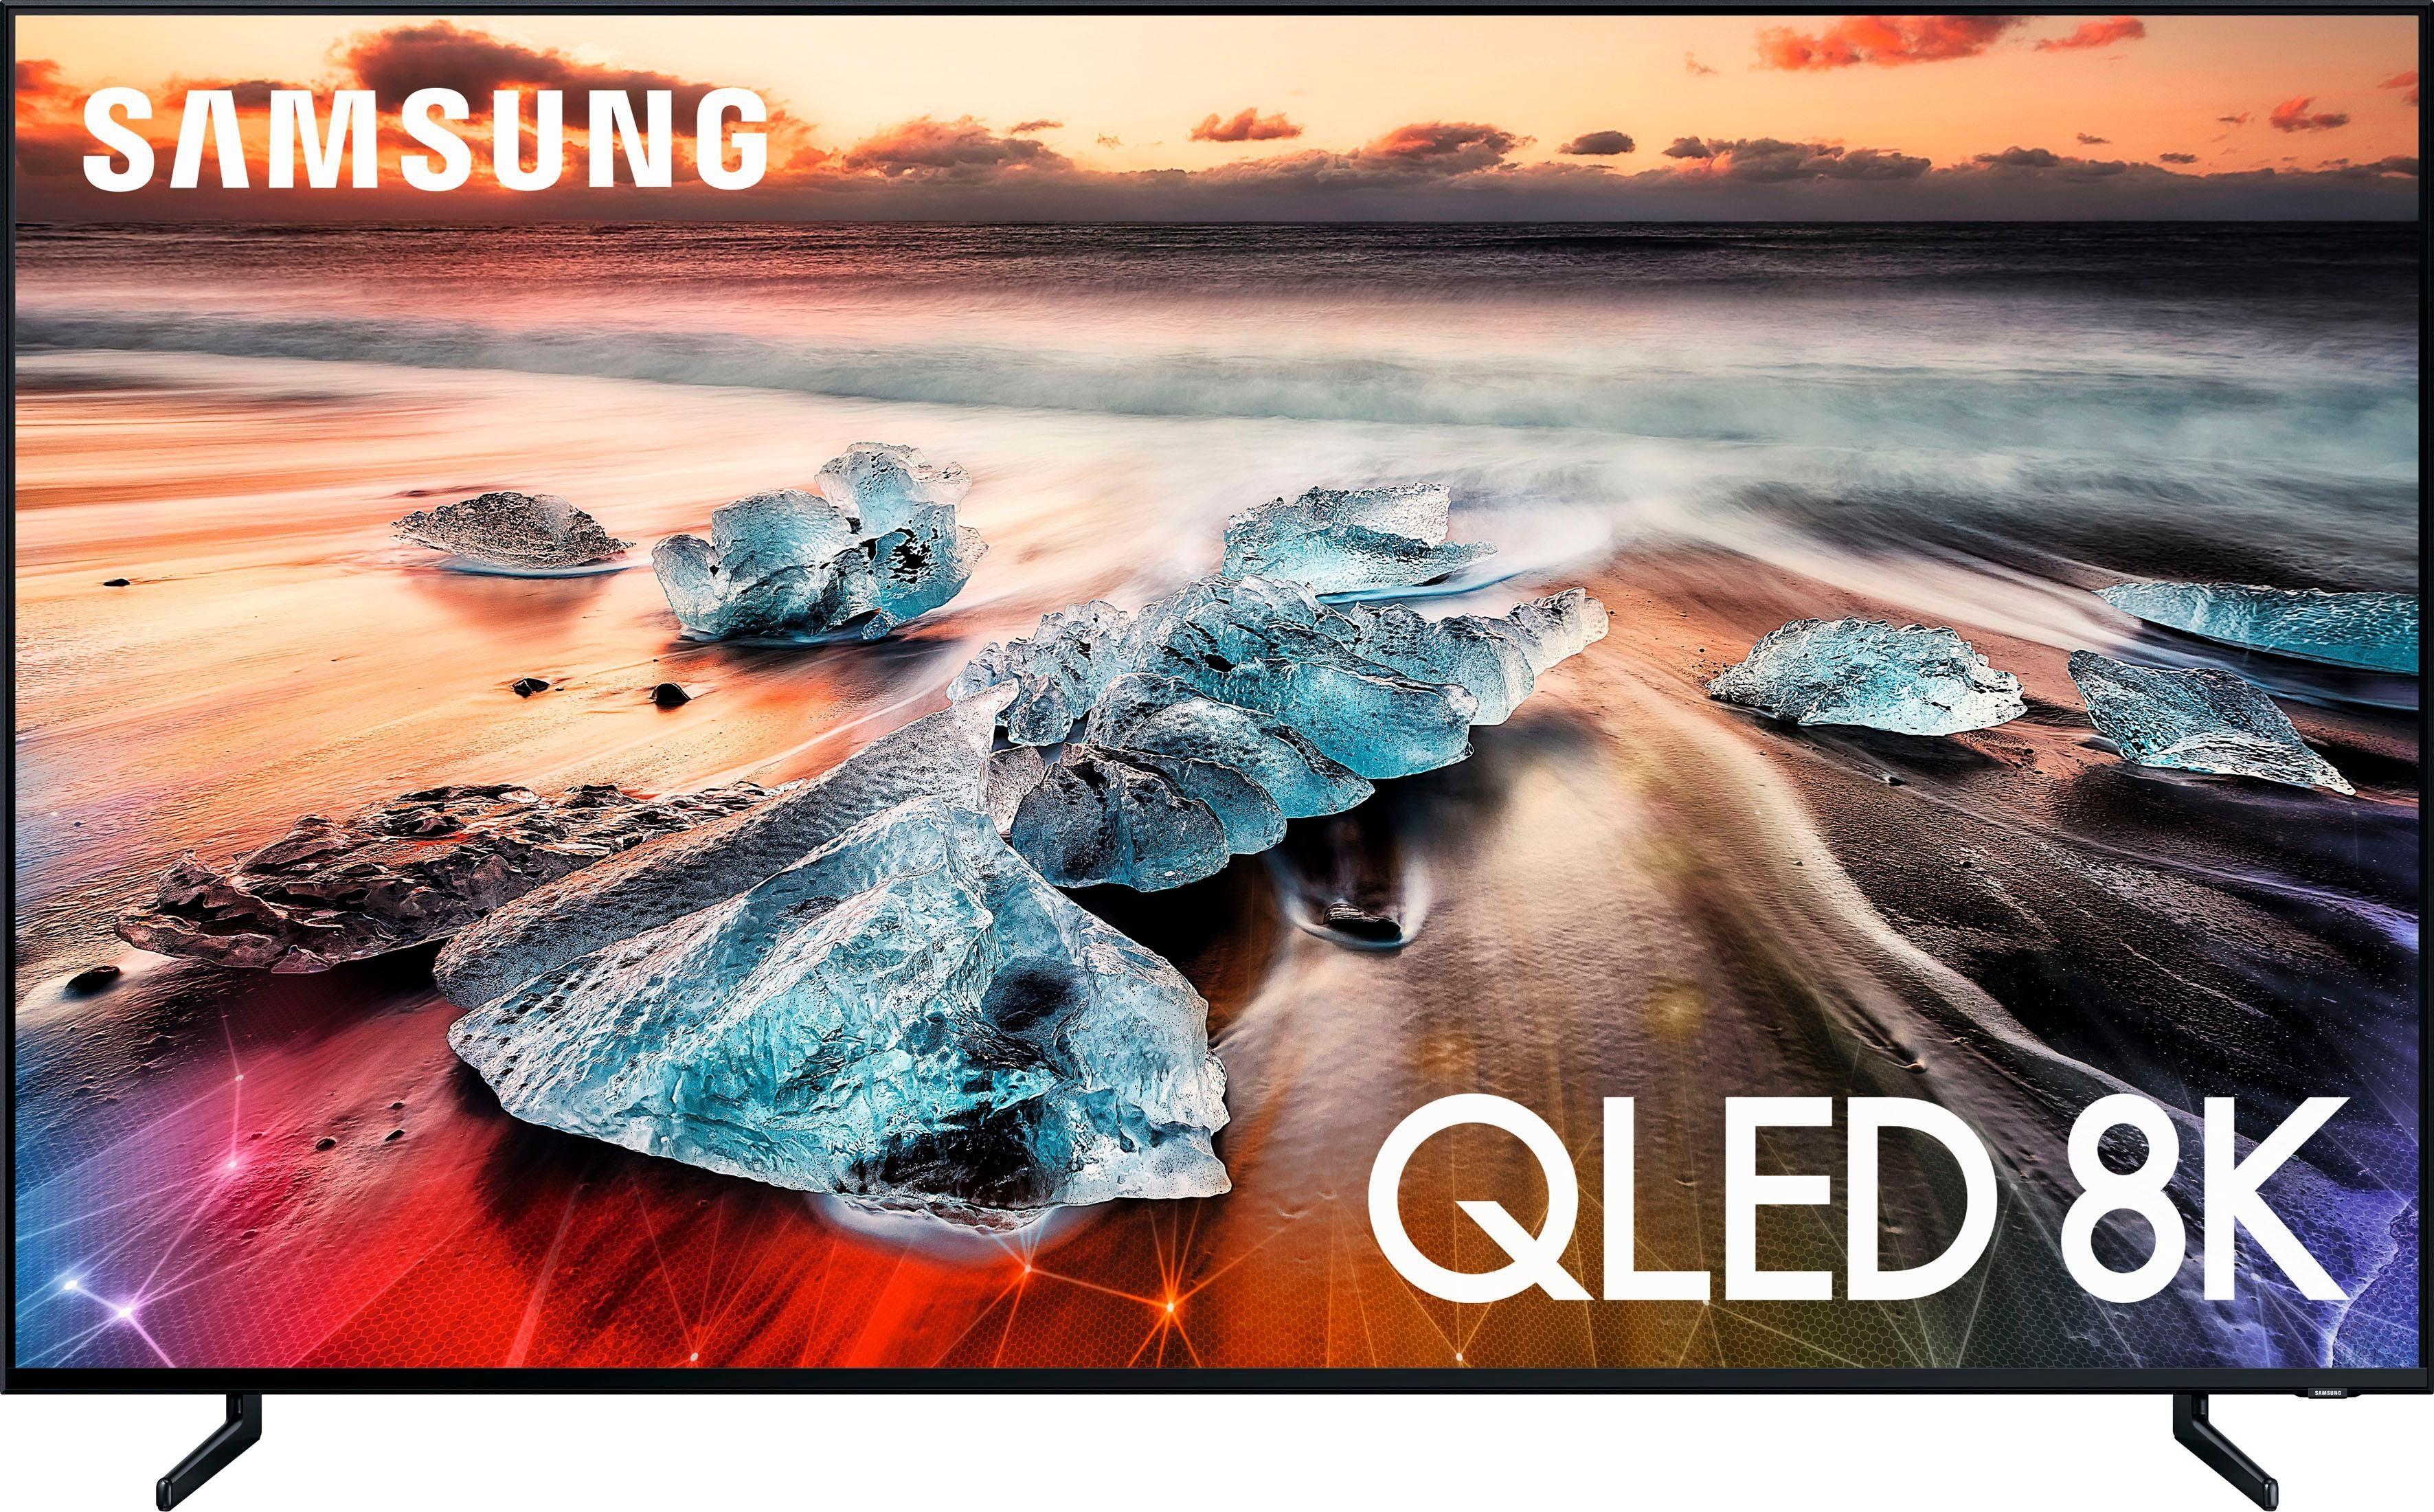 Samsung GQ82Q950R QLED-Fernseher (207 cm/82 Zoll, 8K, Smart-TV)